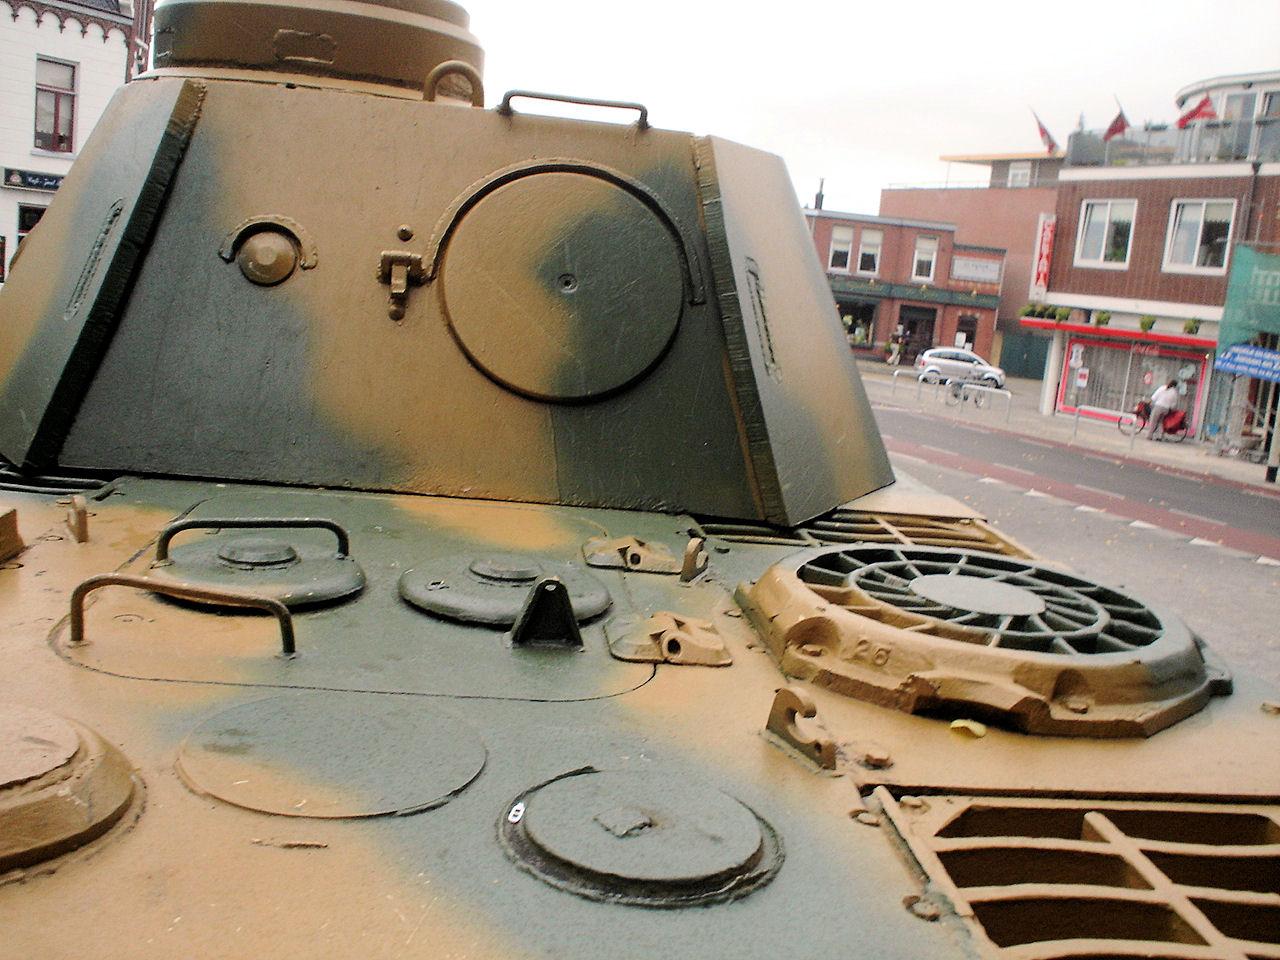 Pz.Kpfw. V Ausf. D Panther